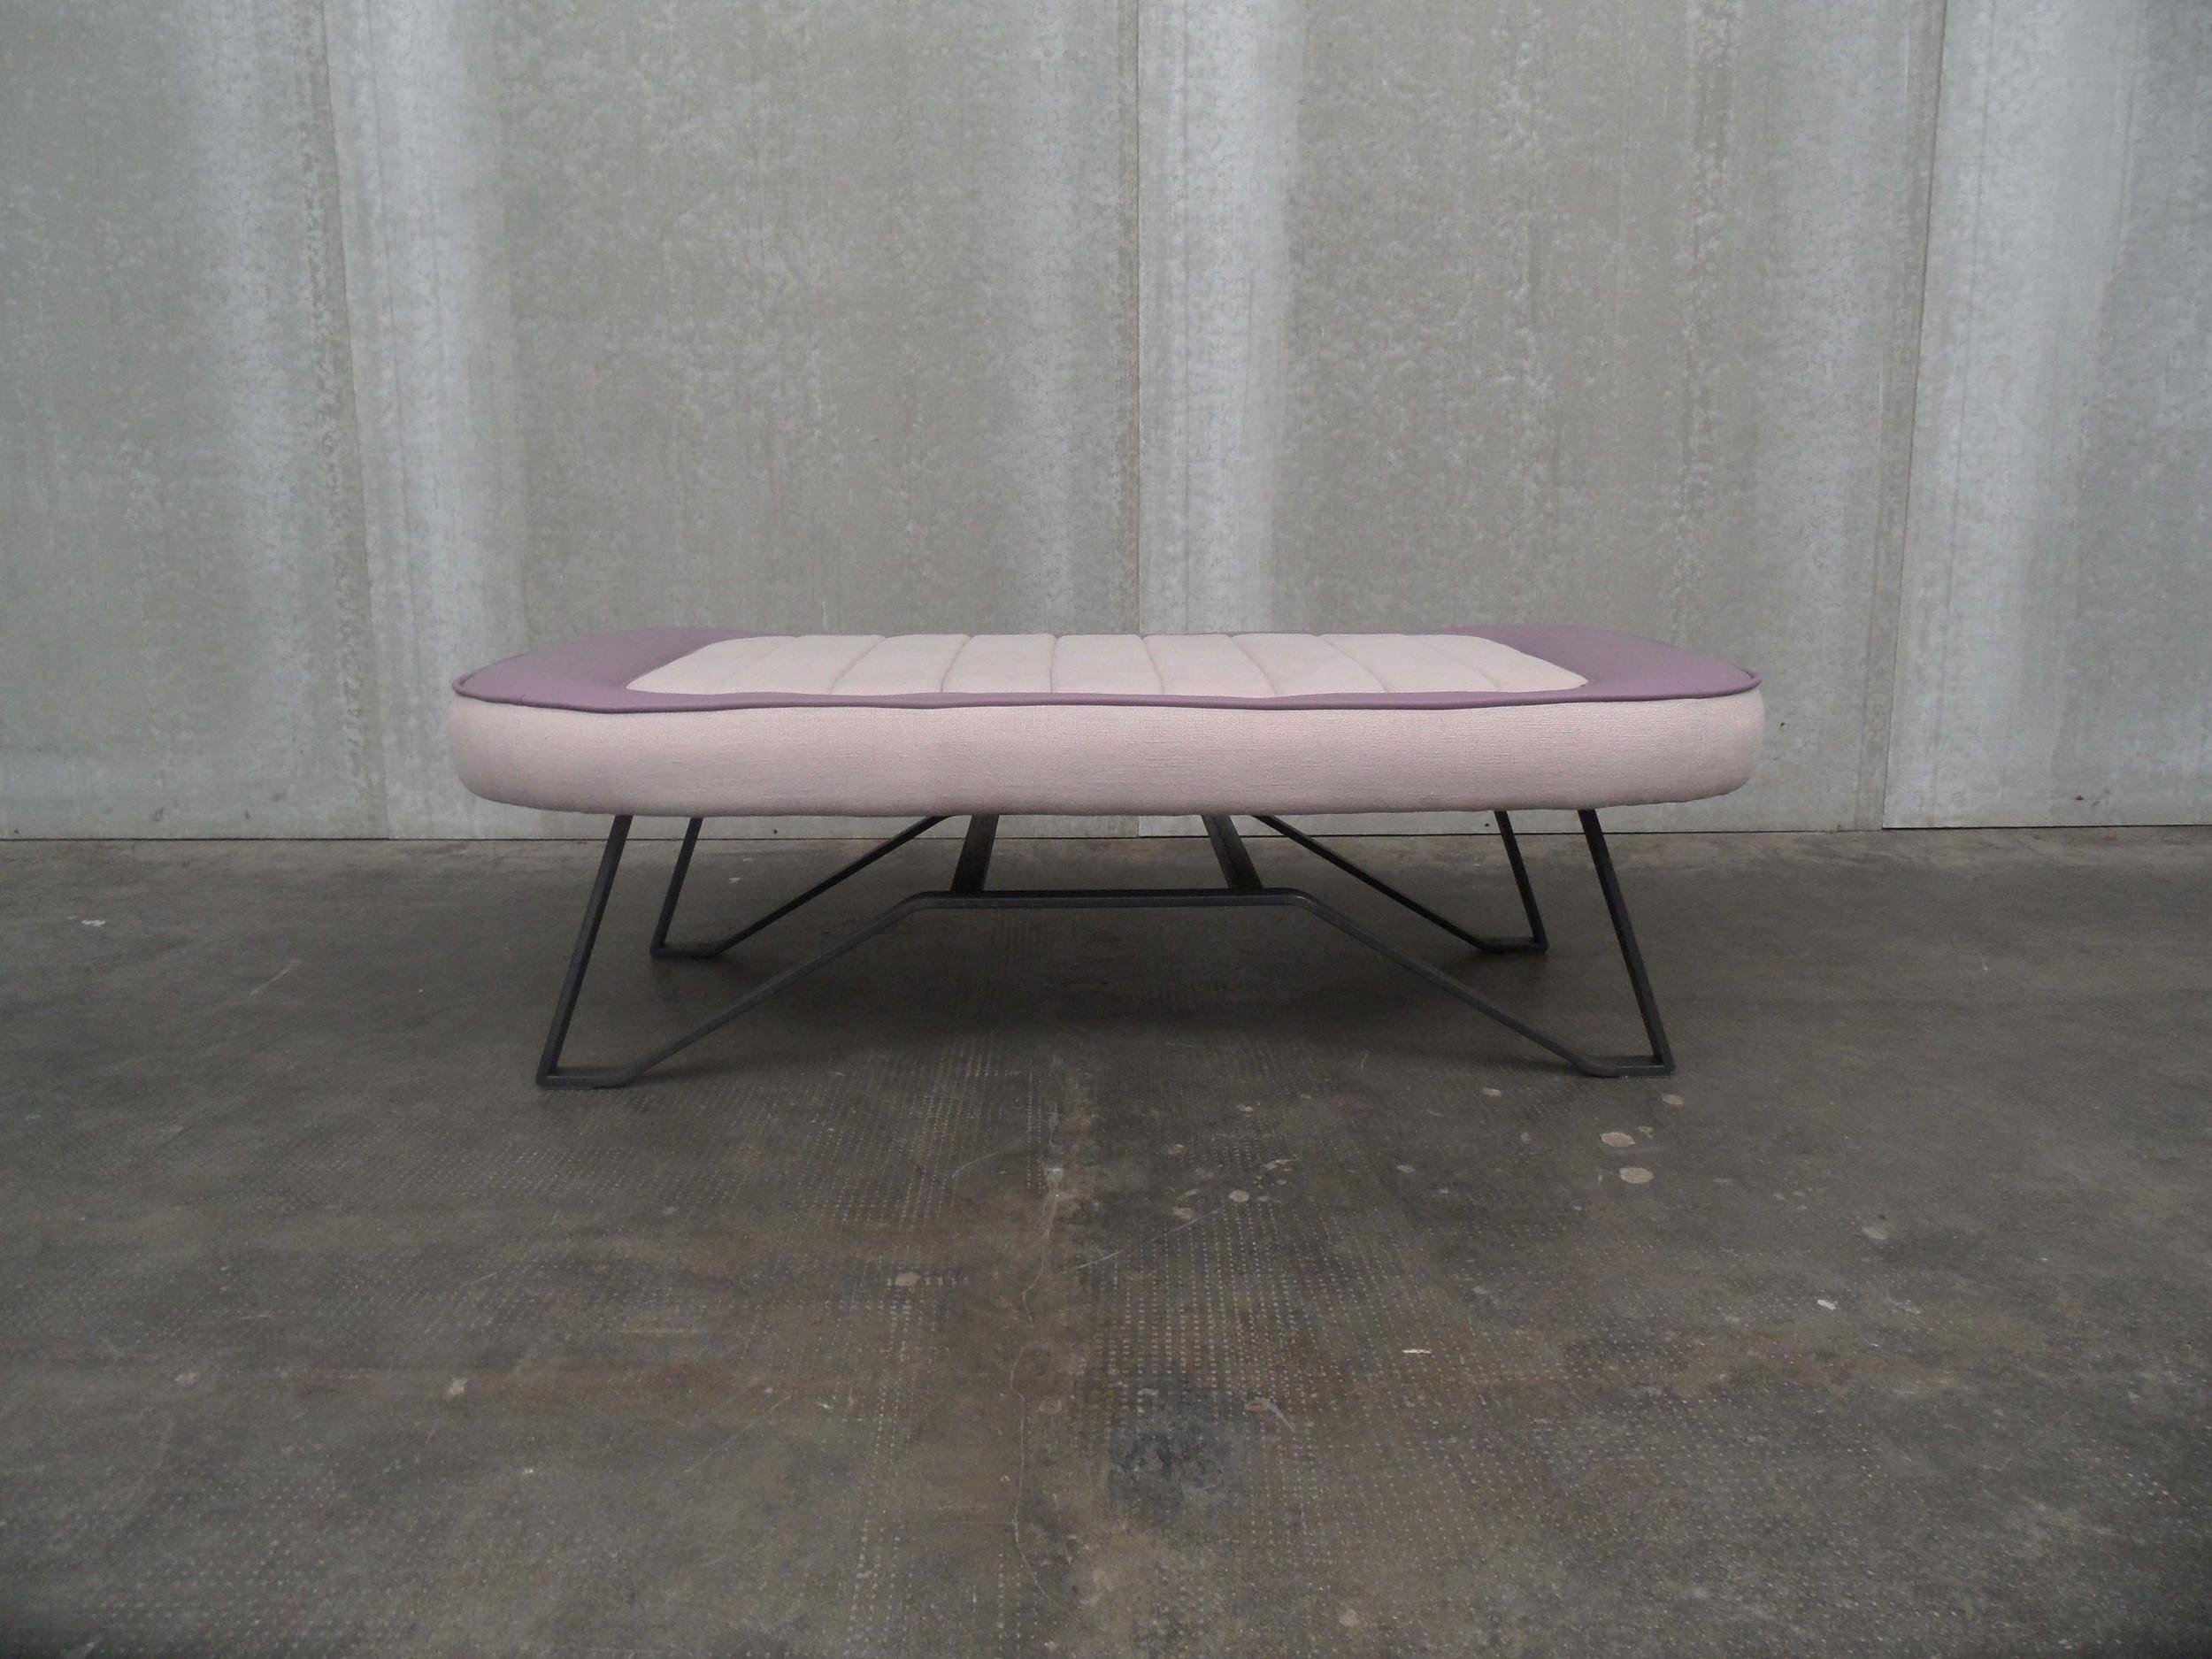 ORVETT for DIESEL - PULMINO BENCH, leather anf fabric